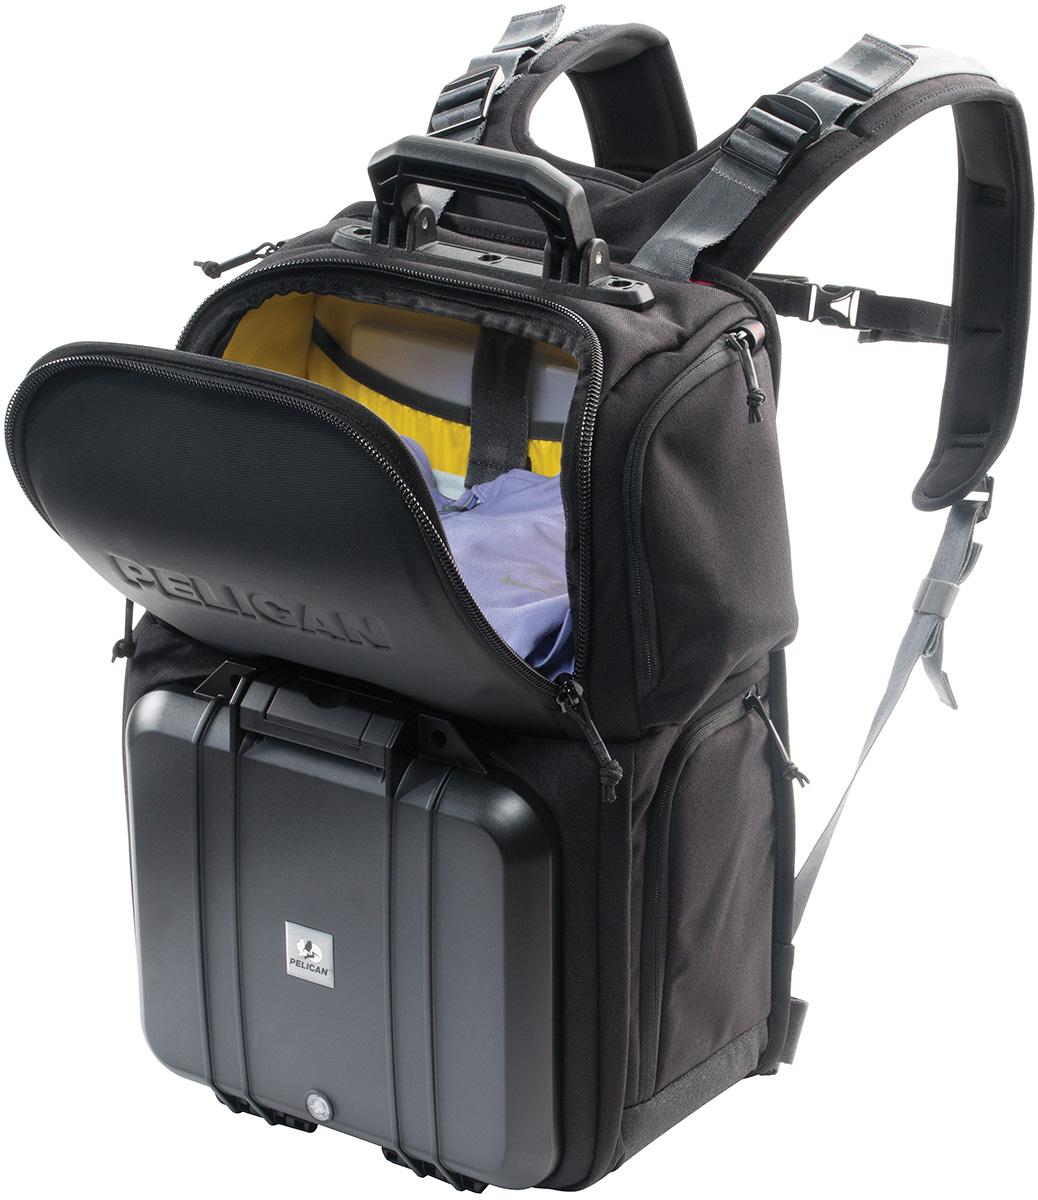 pelican peli products U160 camera protective backpack